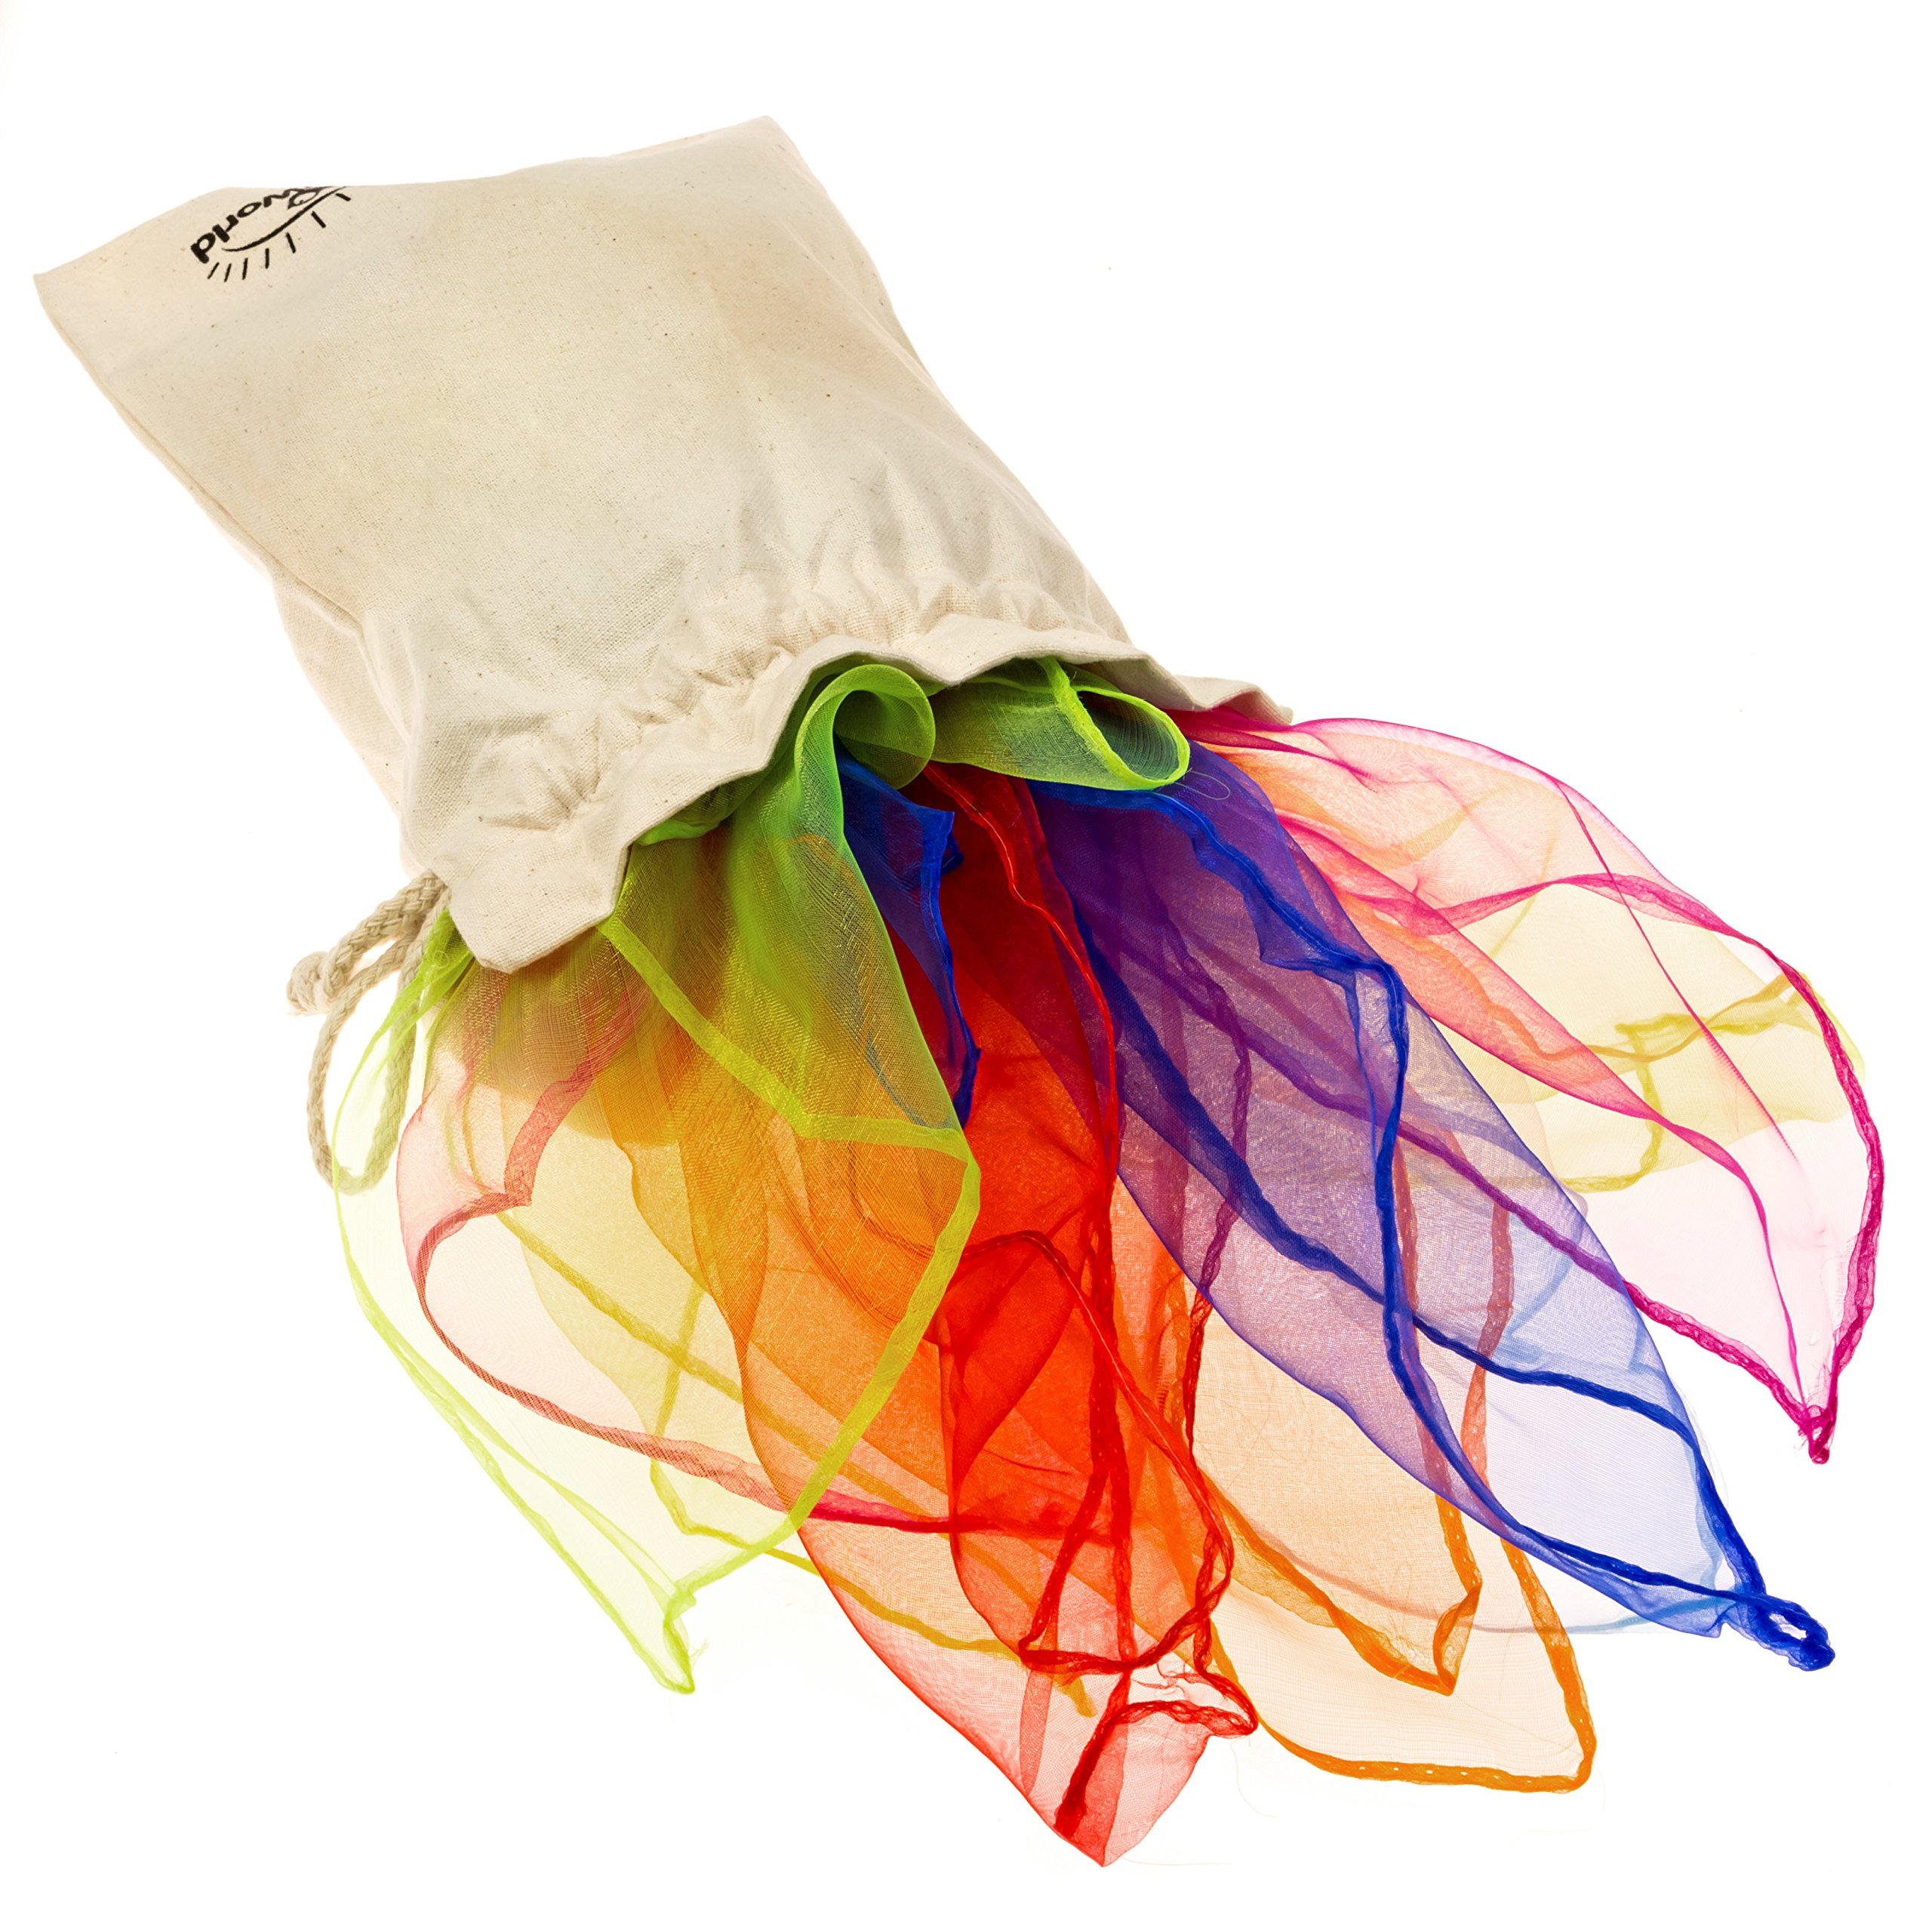 EarlyWorld Play Silks & Bag: 7 Color Set of Large Cloths For Creative Childhood Play